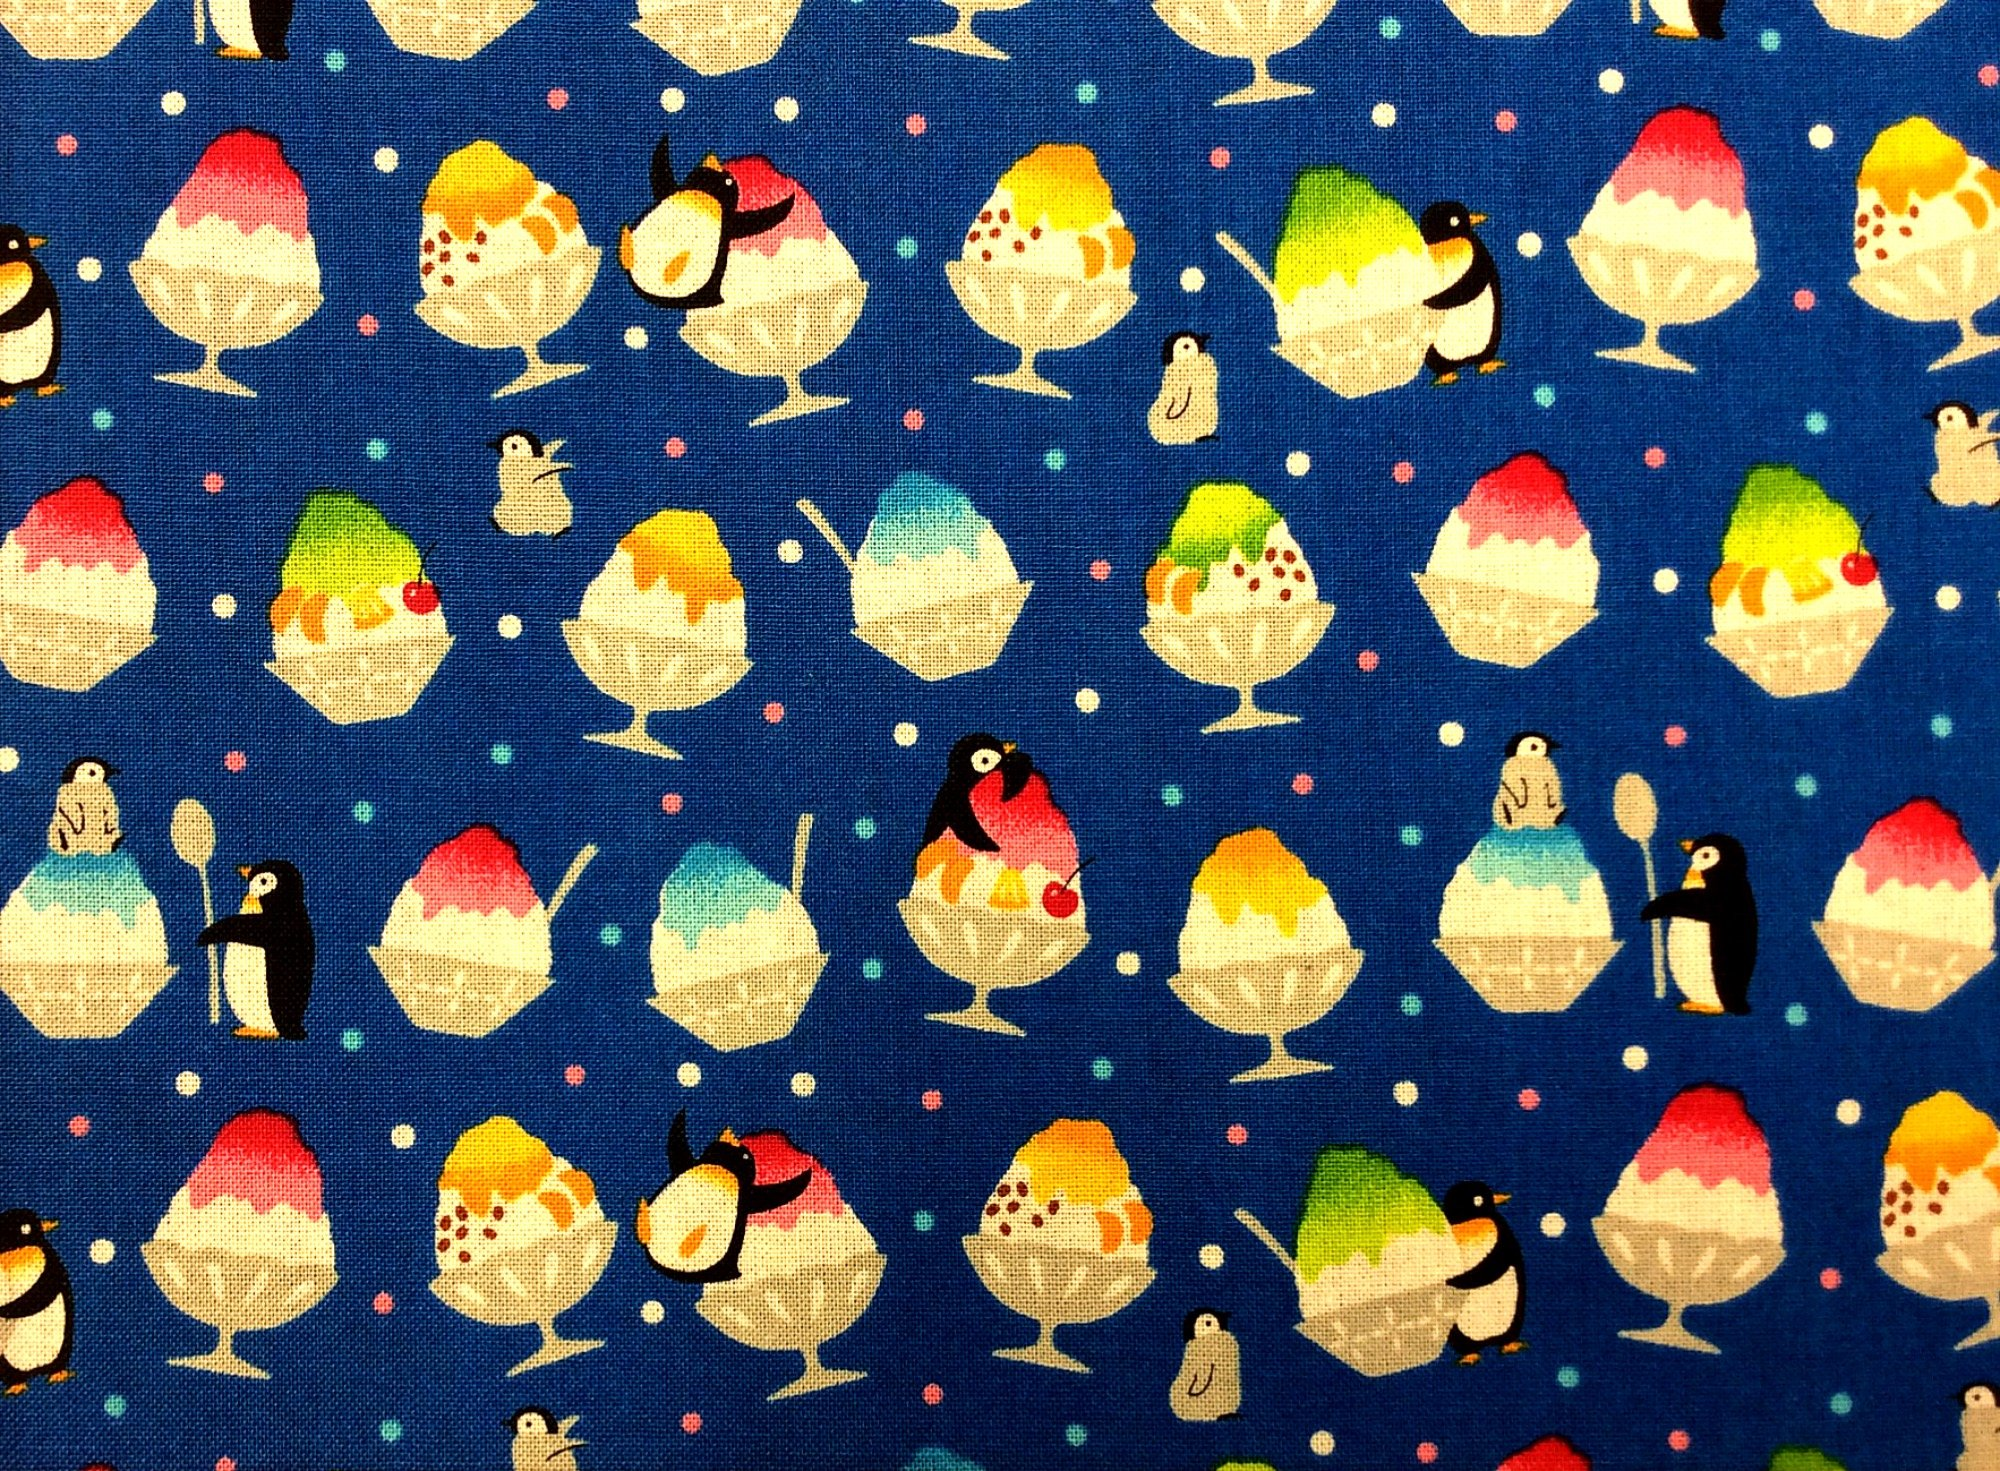 Japanese Asian Retro Penguins Birds Ice Cream Treats Silly Cute Cotton Quilt Fabric QH37